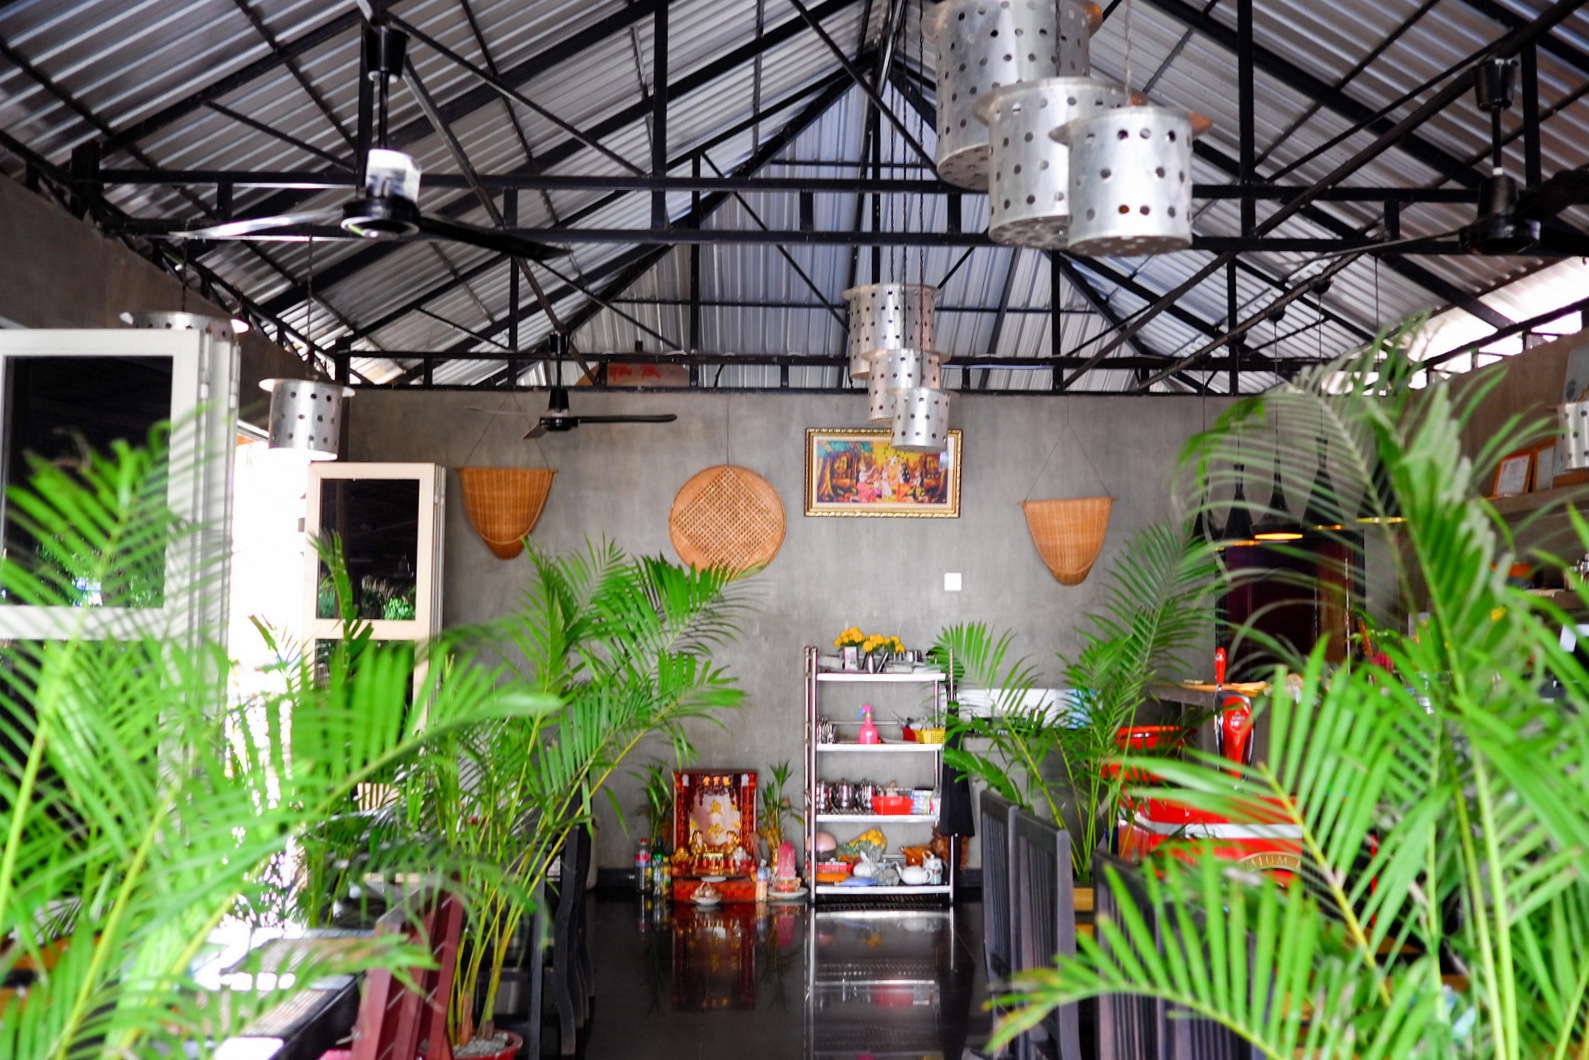 Chong Phov Khmer Restaurant, Siem Reap, Cambodia